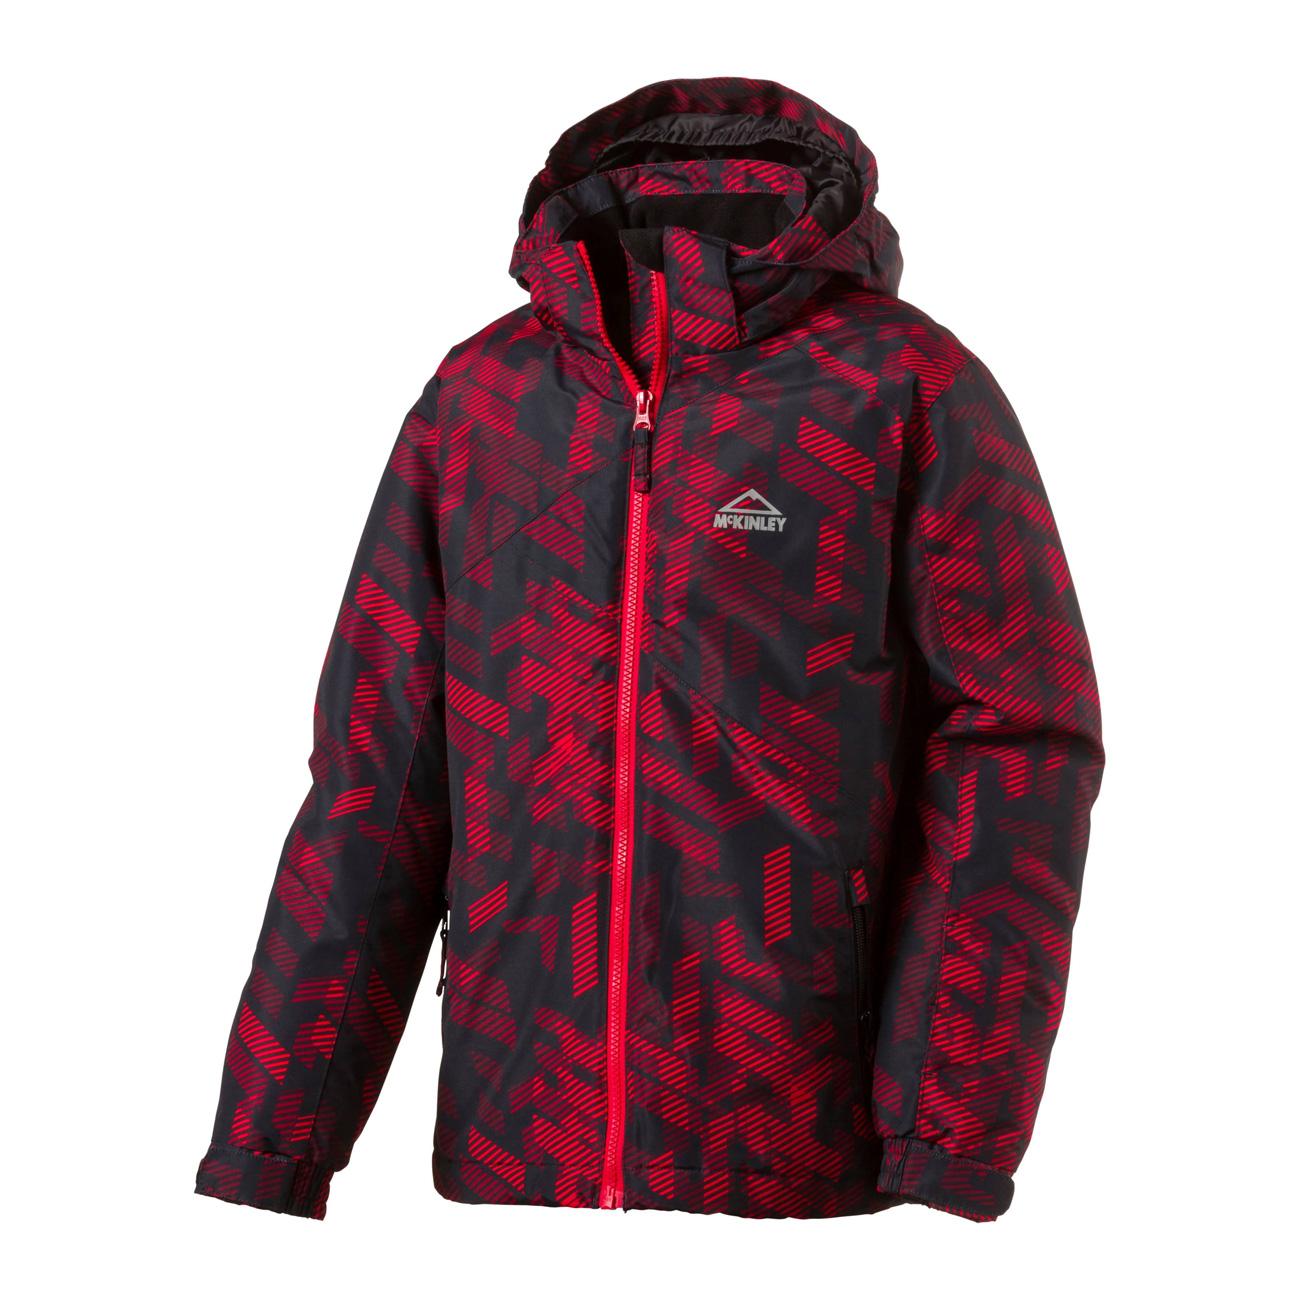 bc96559a2 McKINLEY Boy s Cody Ski Jacket- Black Red